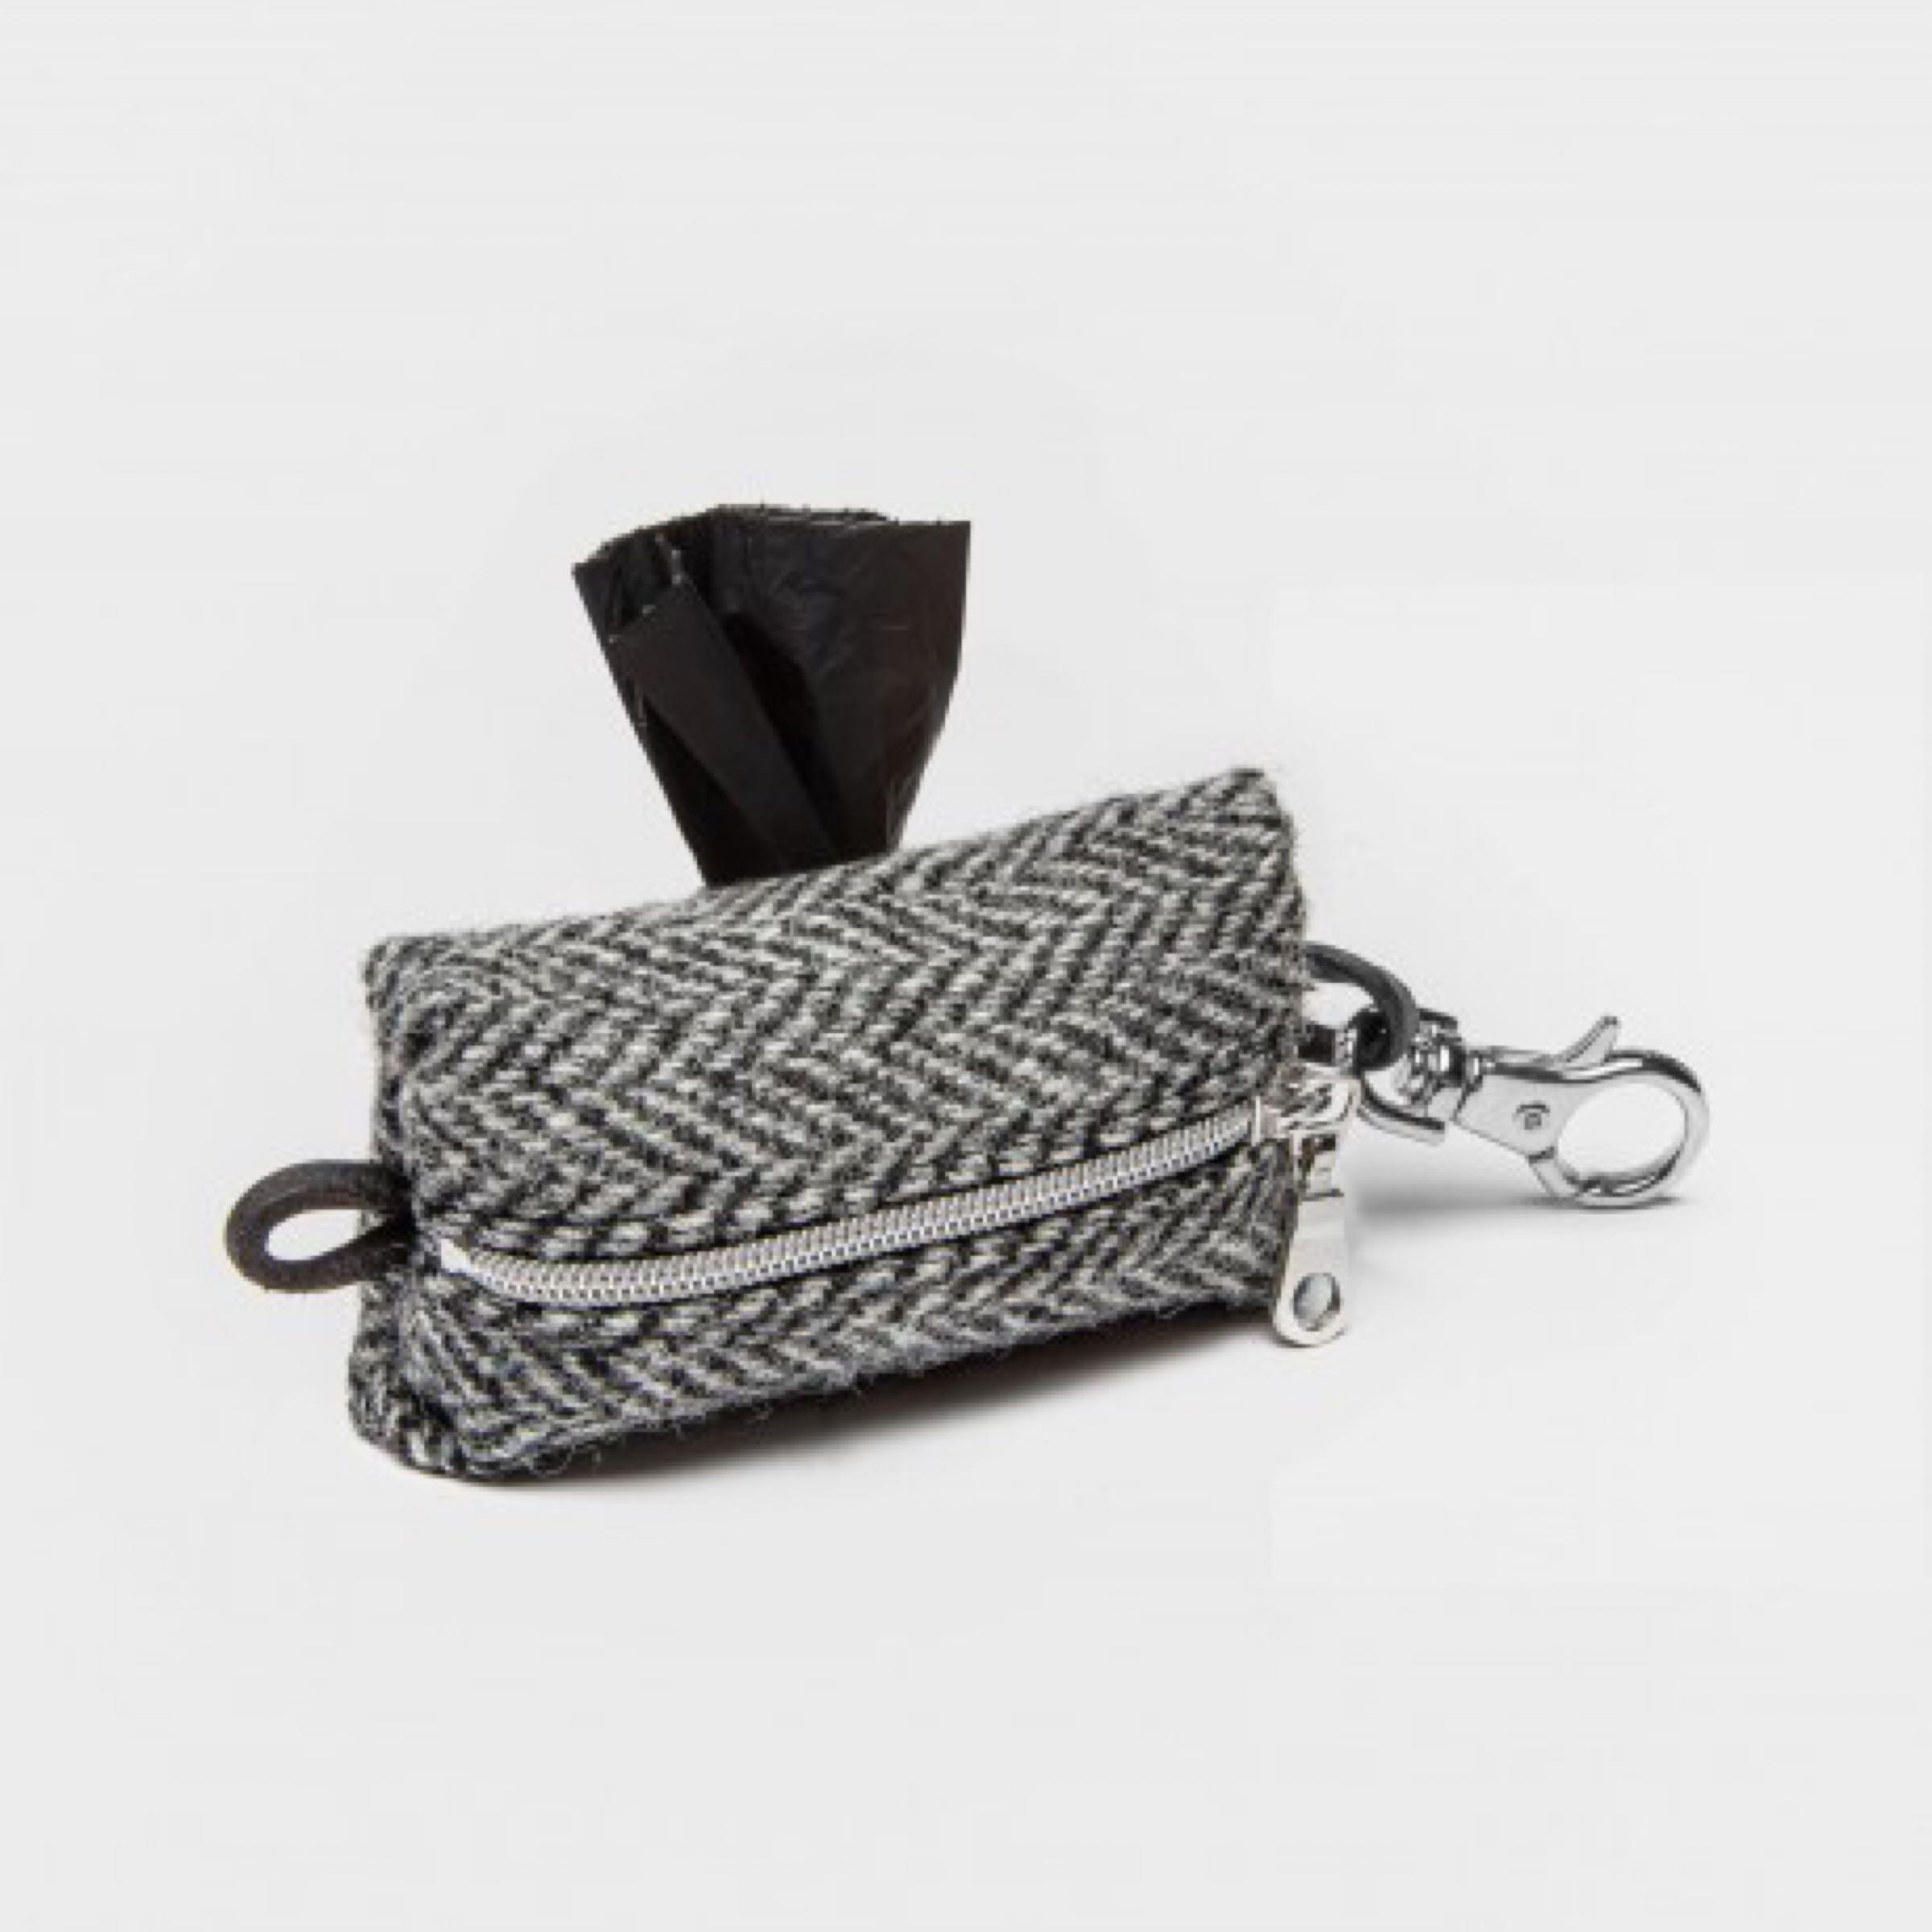 Doggy-Do-Bag Fishbone Black